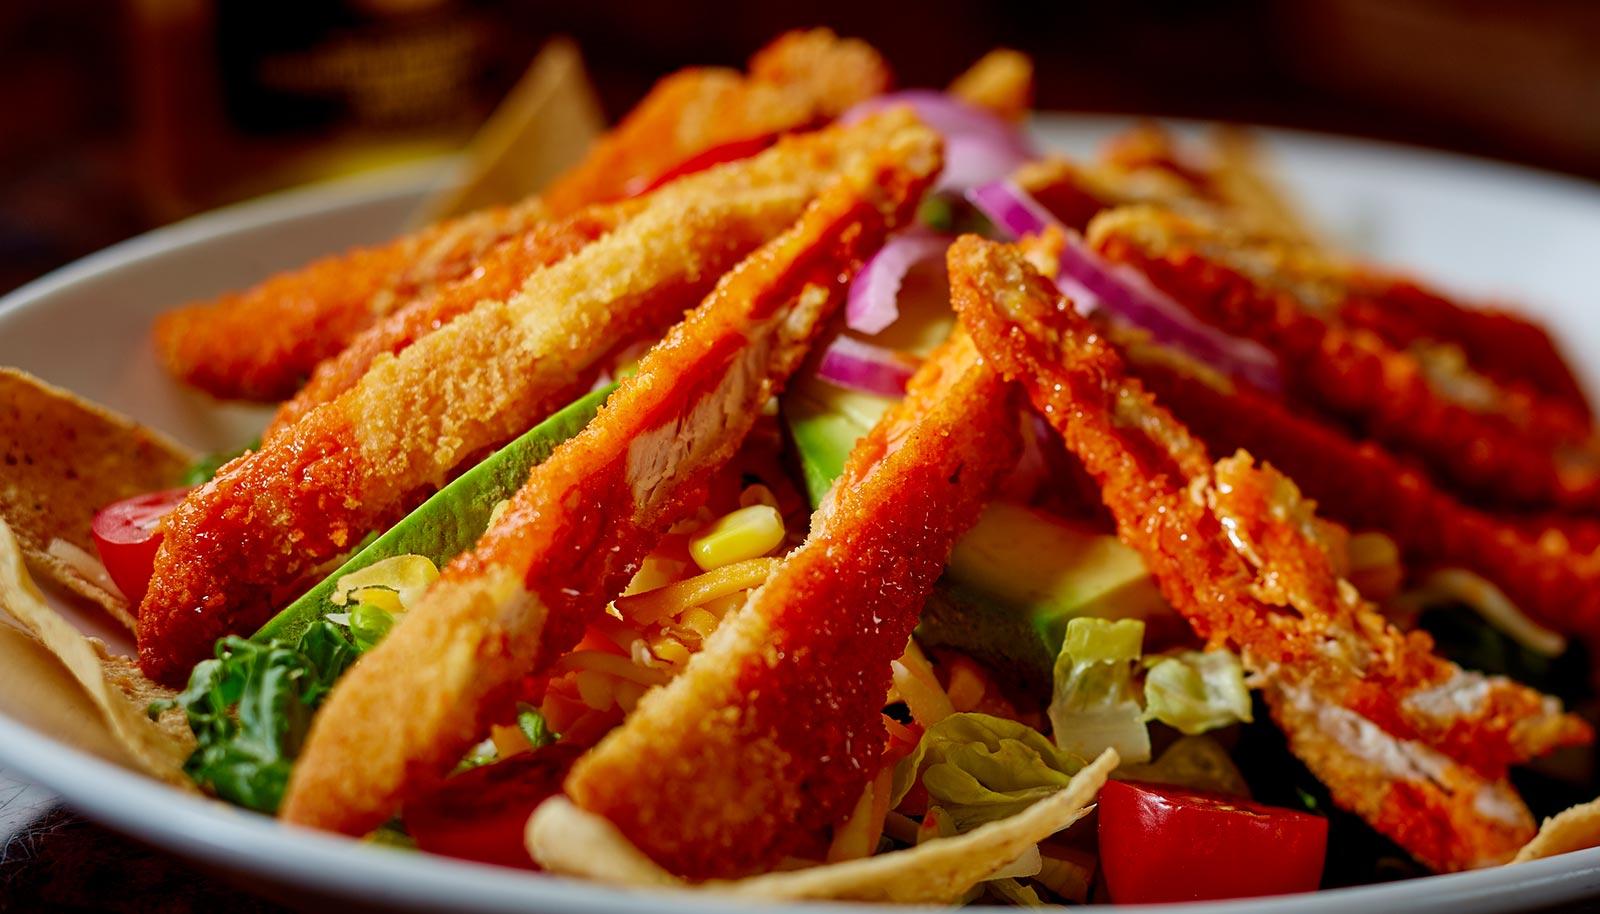 Nevada Diner   Restaurant Bloomfield NJ 07003 Essex County